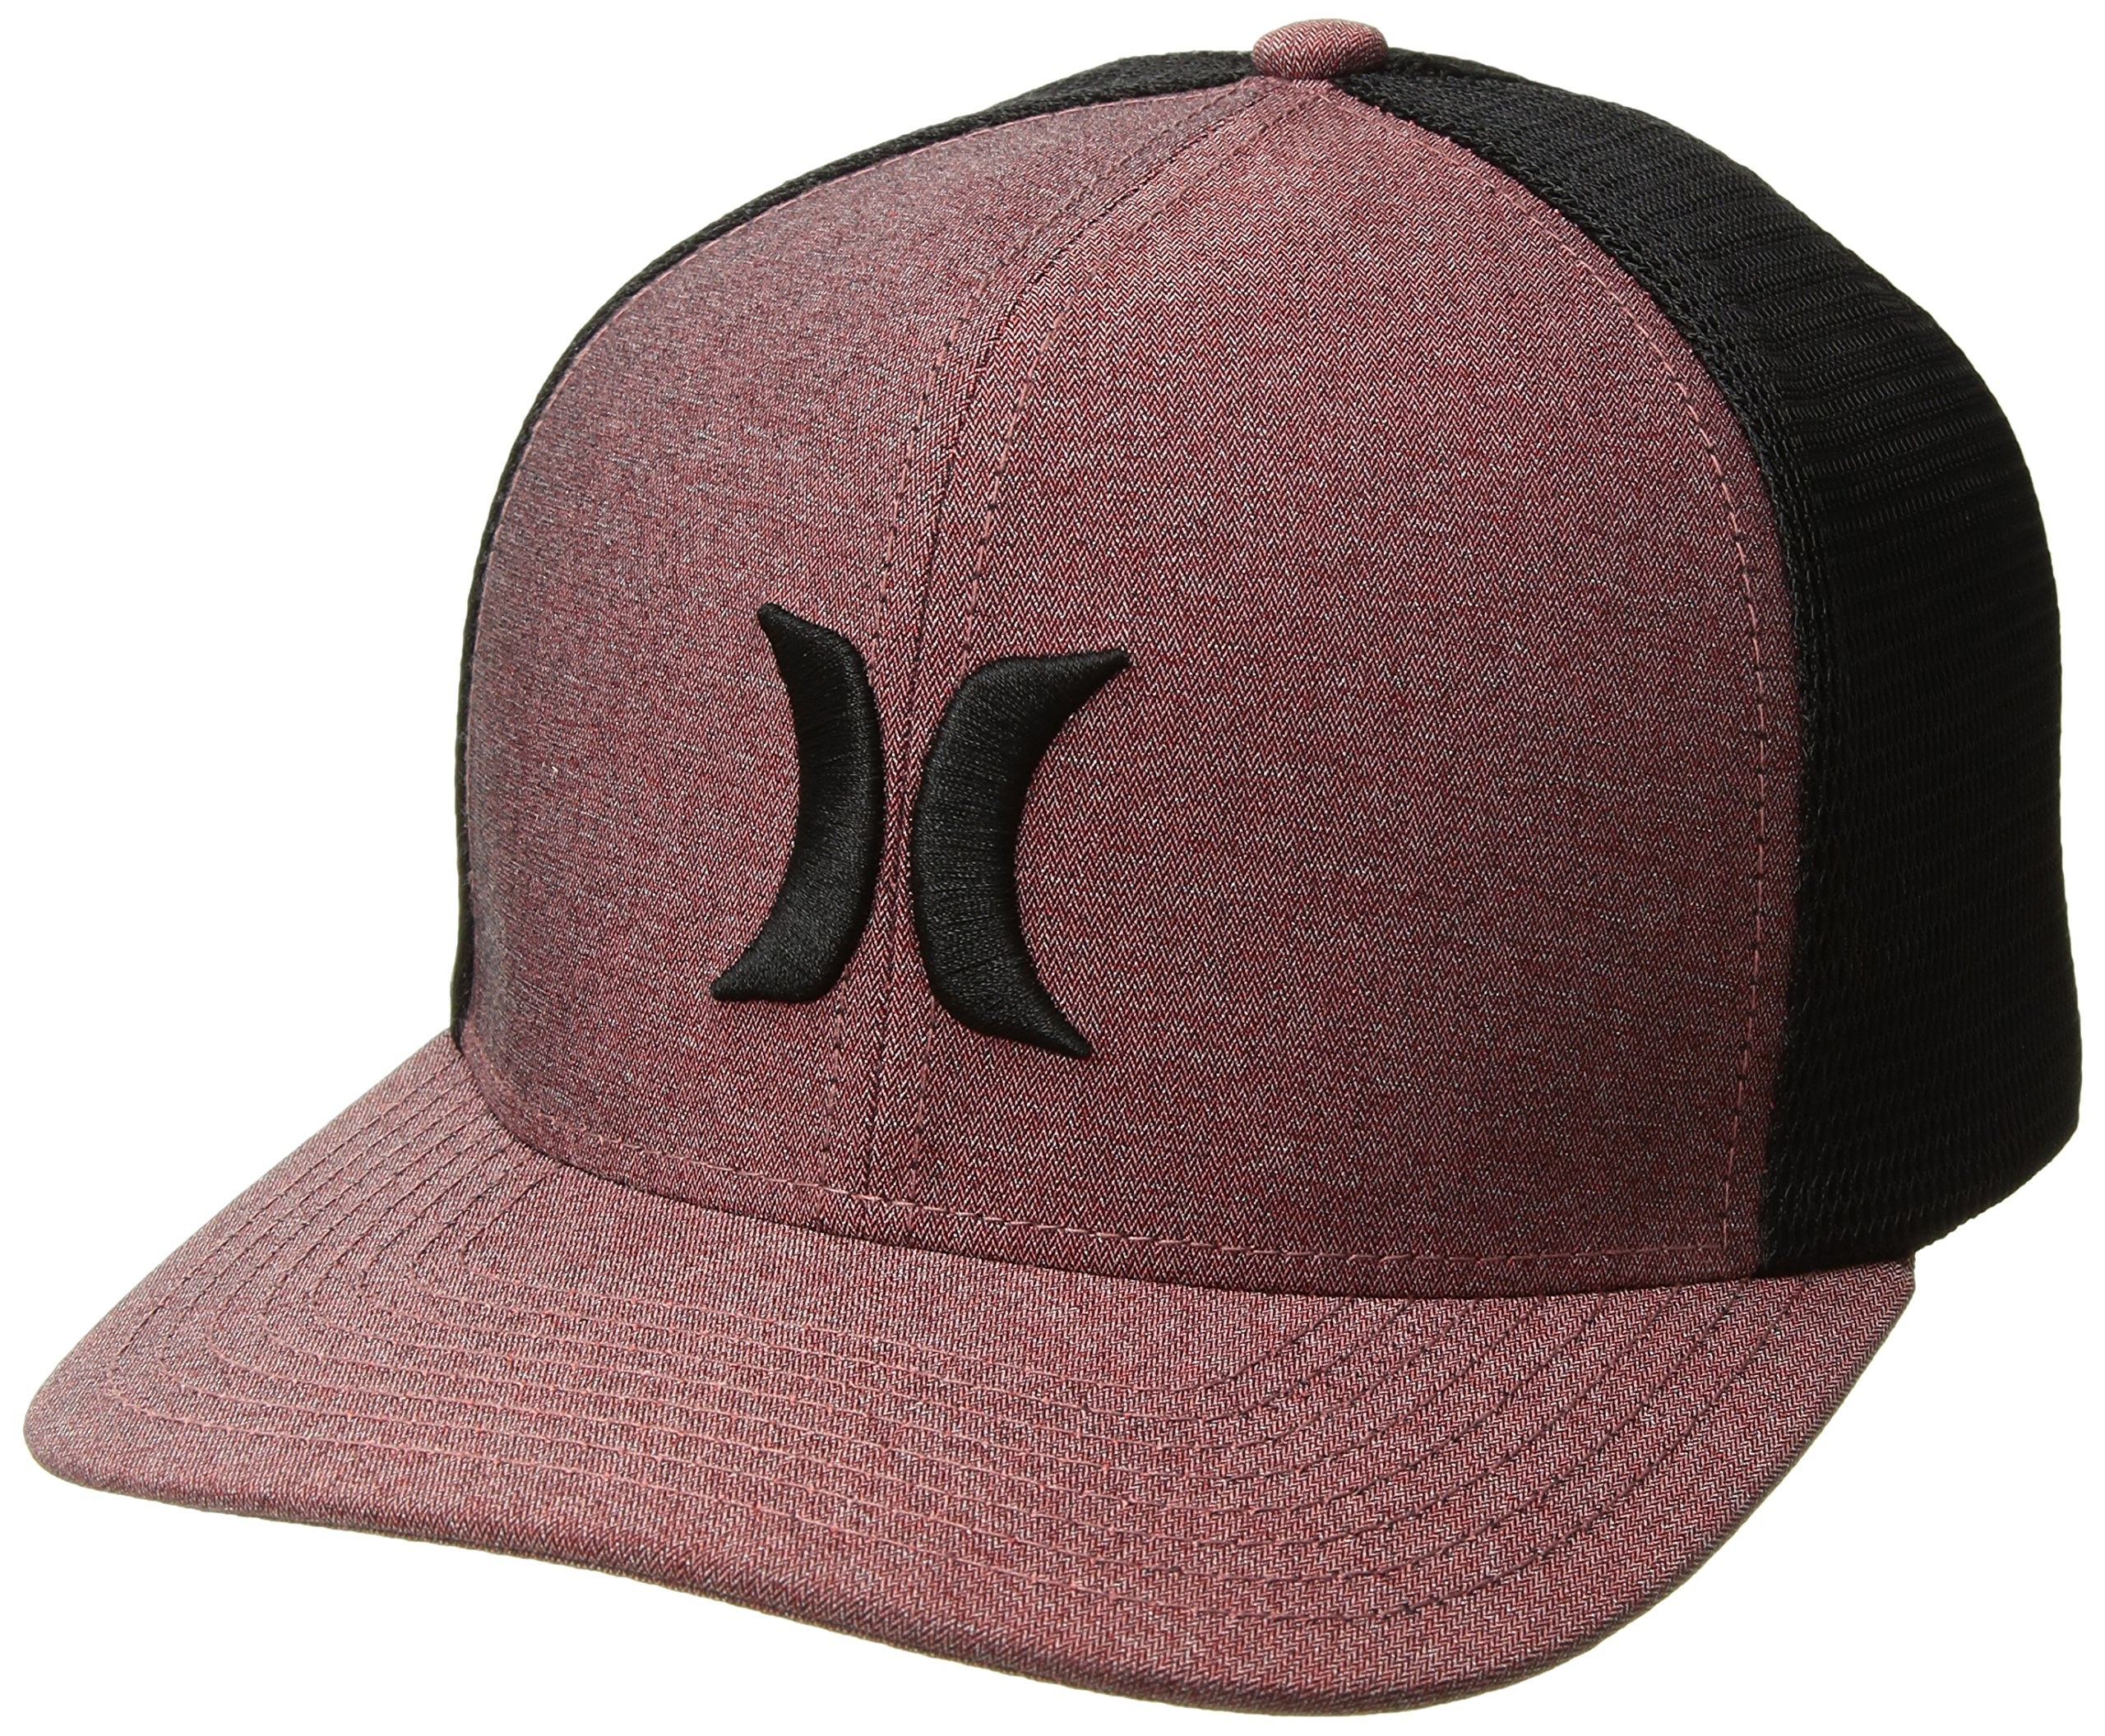 3eb3798eab7b7 Hurley Men s Black Textures Baseball Cap